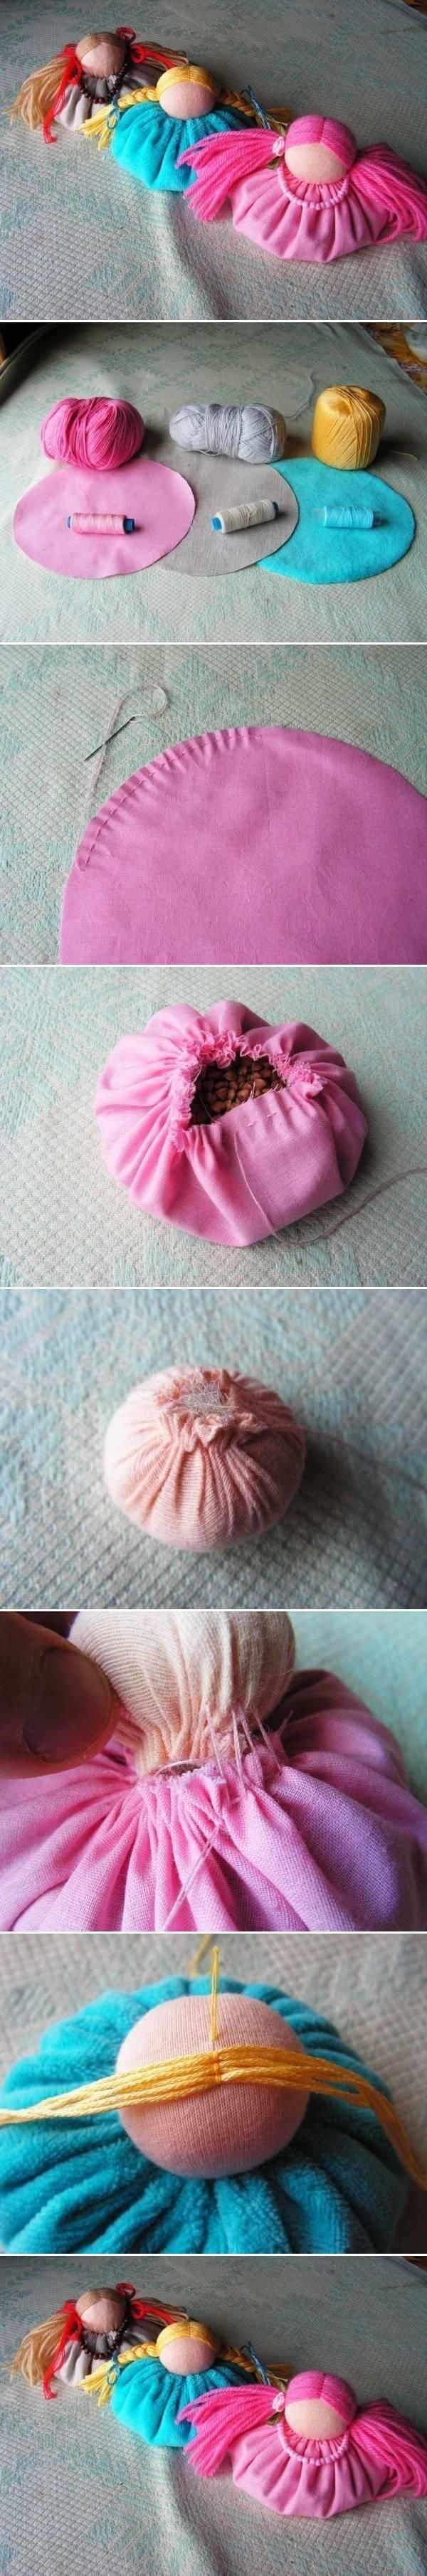 DIY Tutorial DIY Fabric Dolls / DIY Fabric Doll Ornament - Bead&Cord